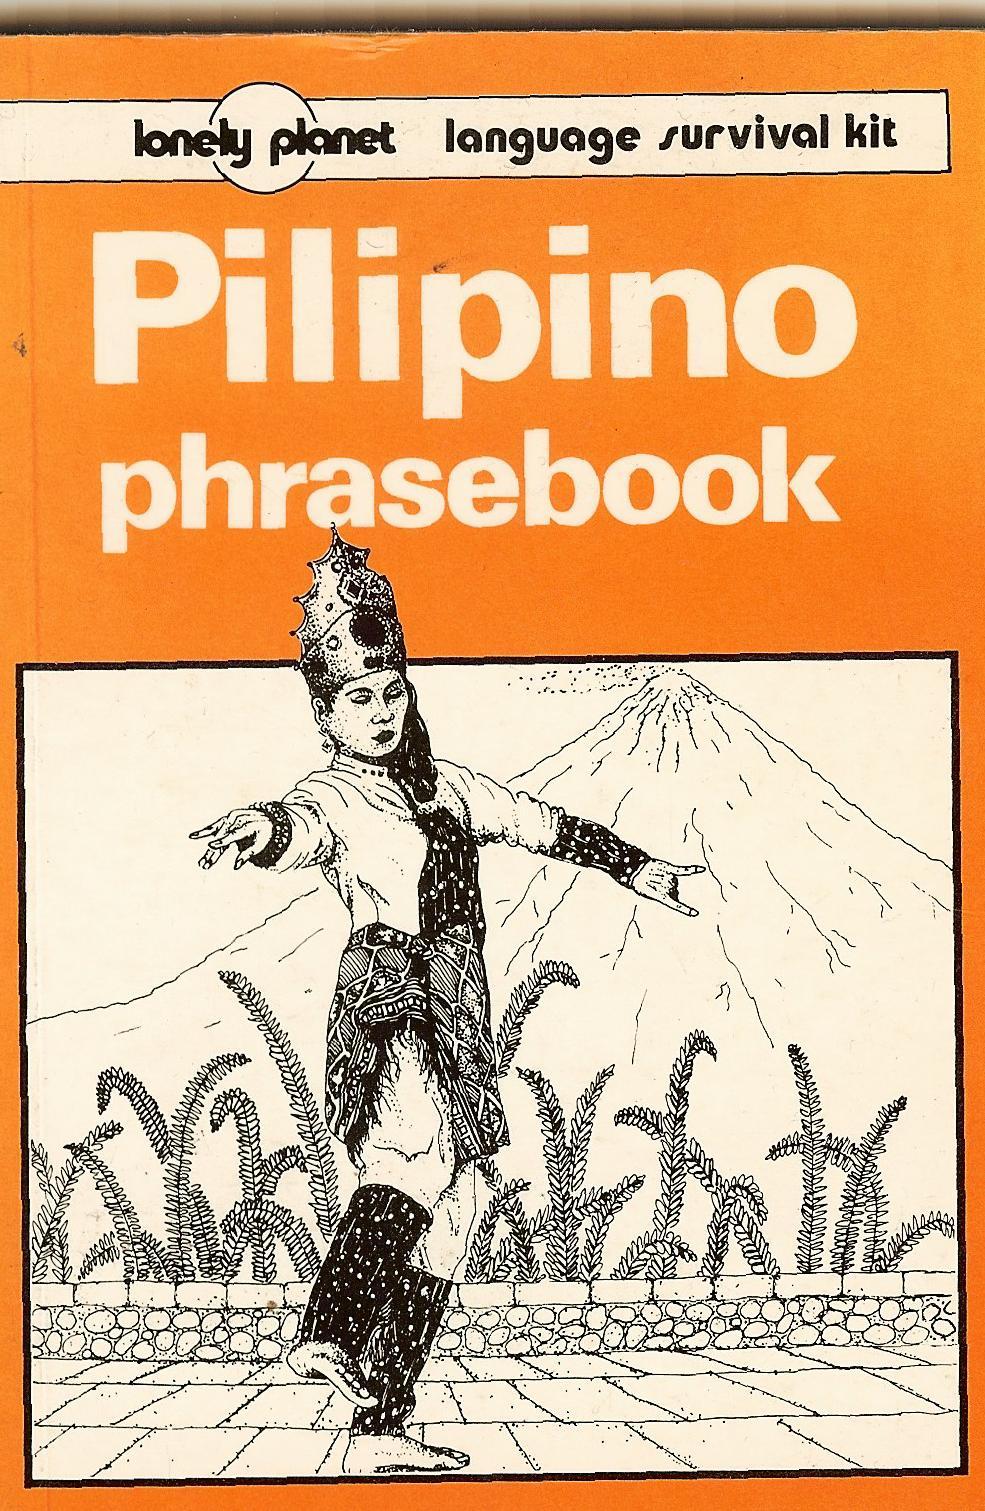 [pilipino+phrasebook]